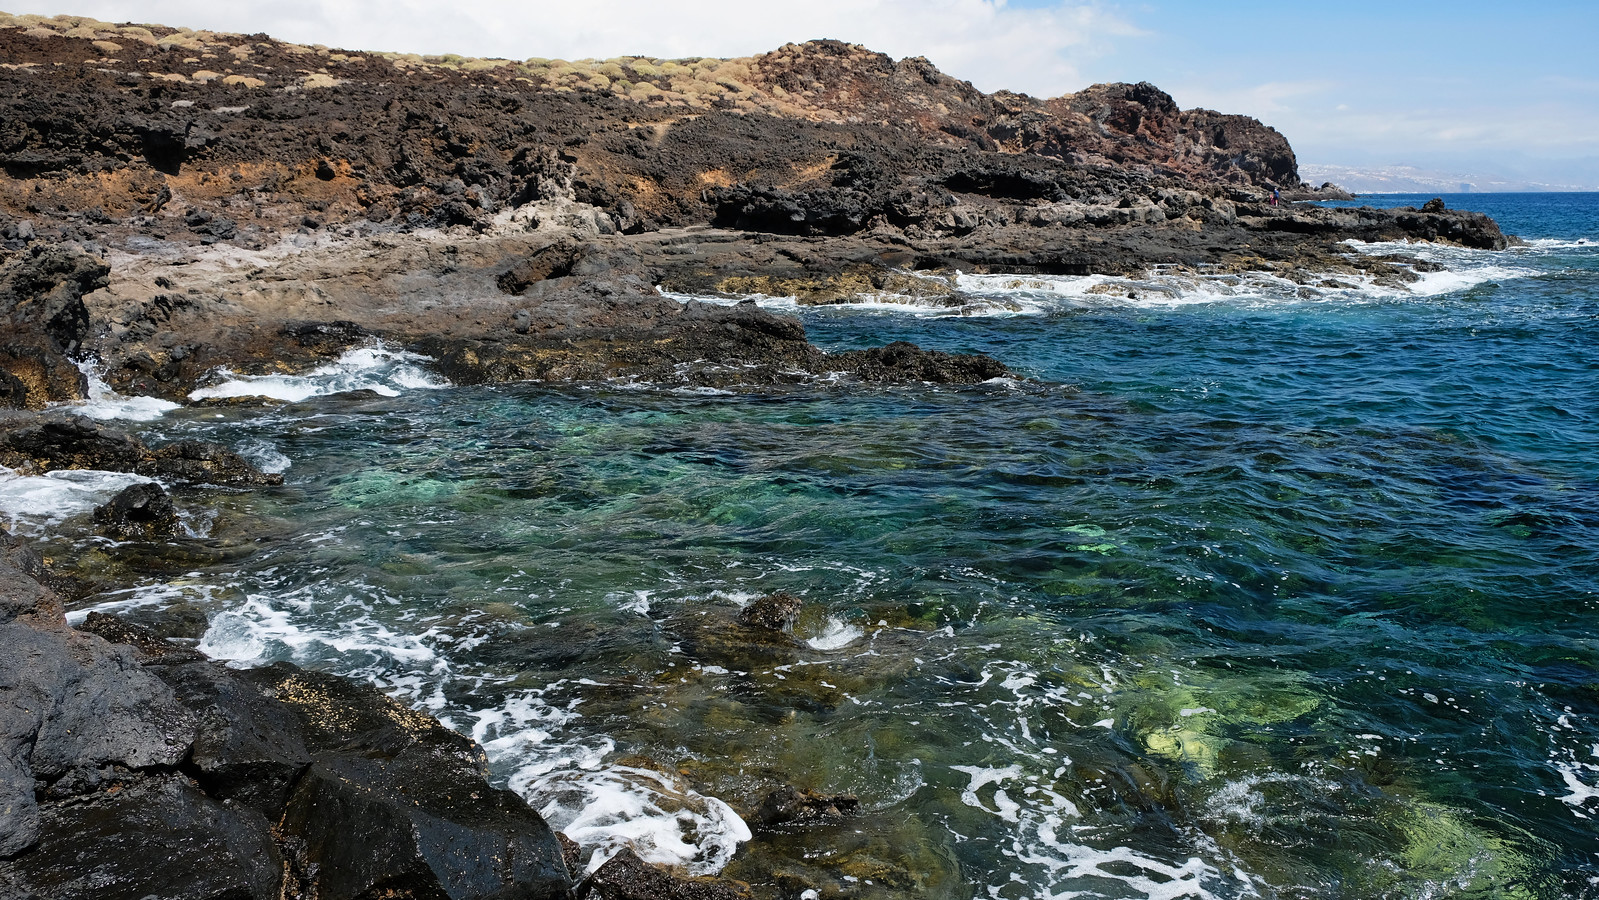 Malpaís de Güímar Special Nature Reserve, Tenerife, Canary Islands, Spain